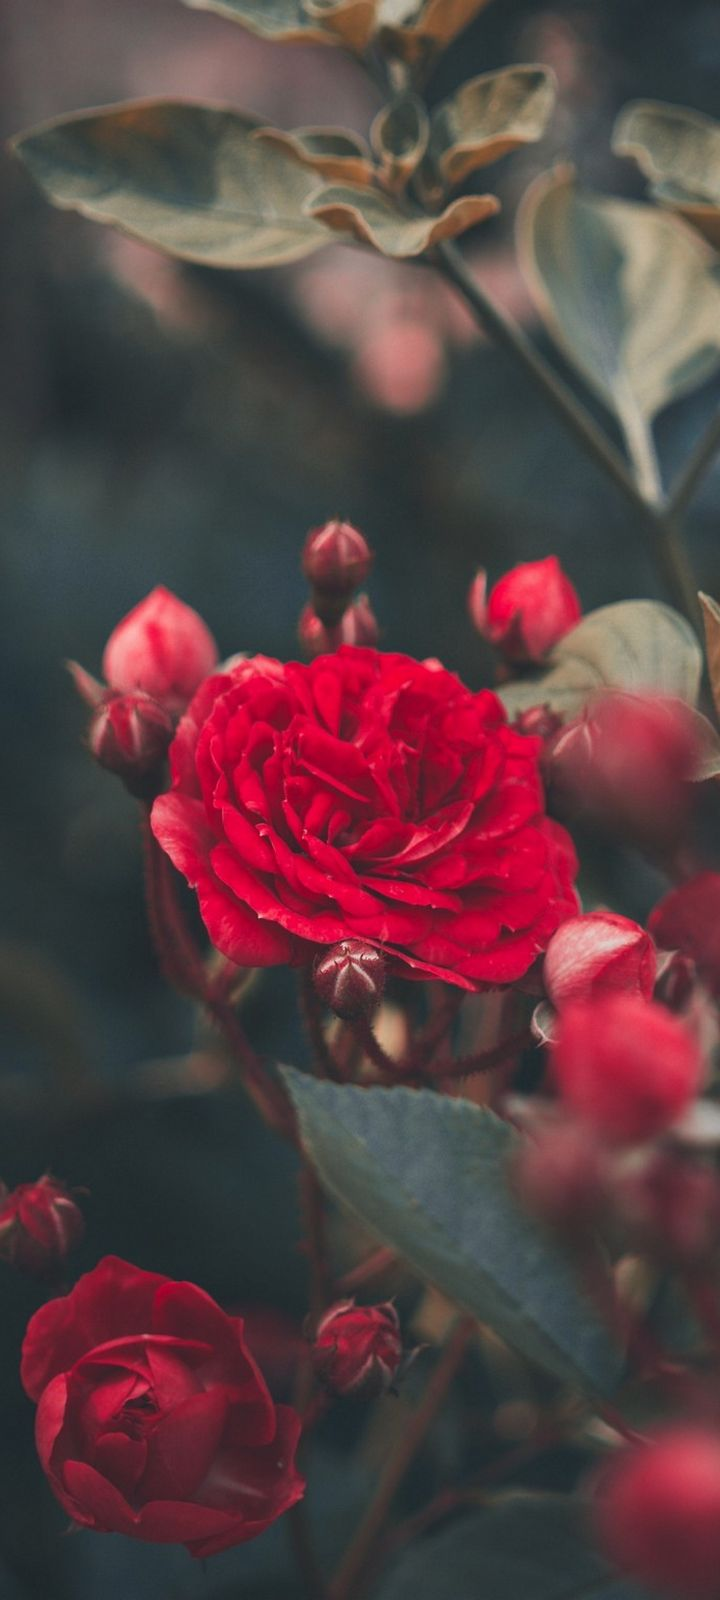 Red Rose Bush Garden Wallpaper 720x1600